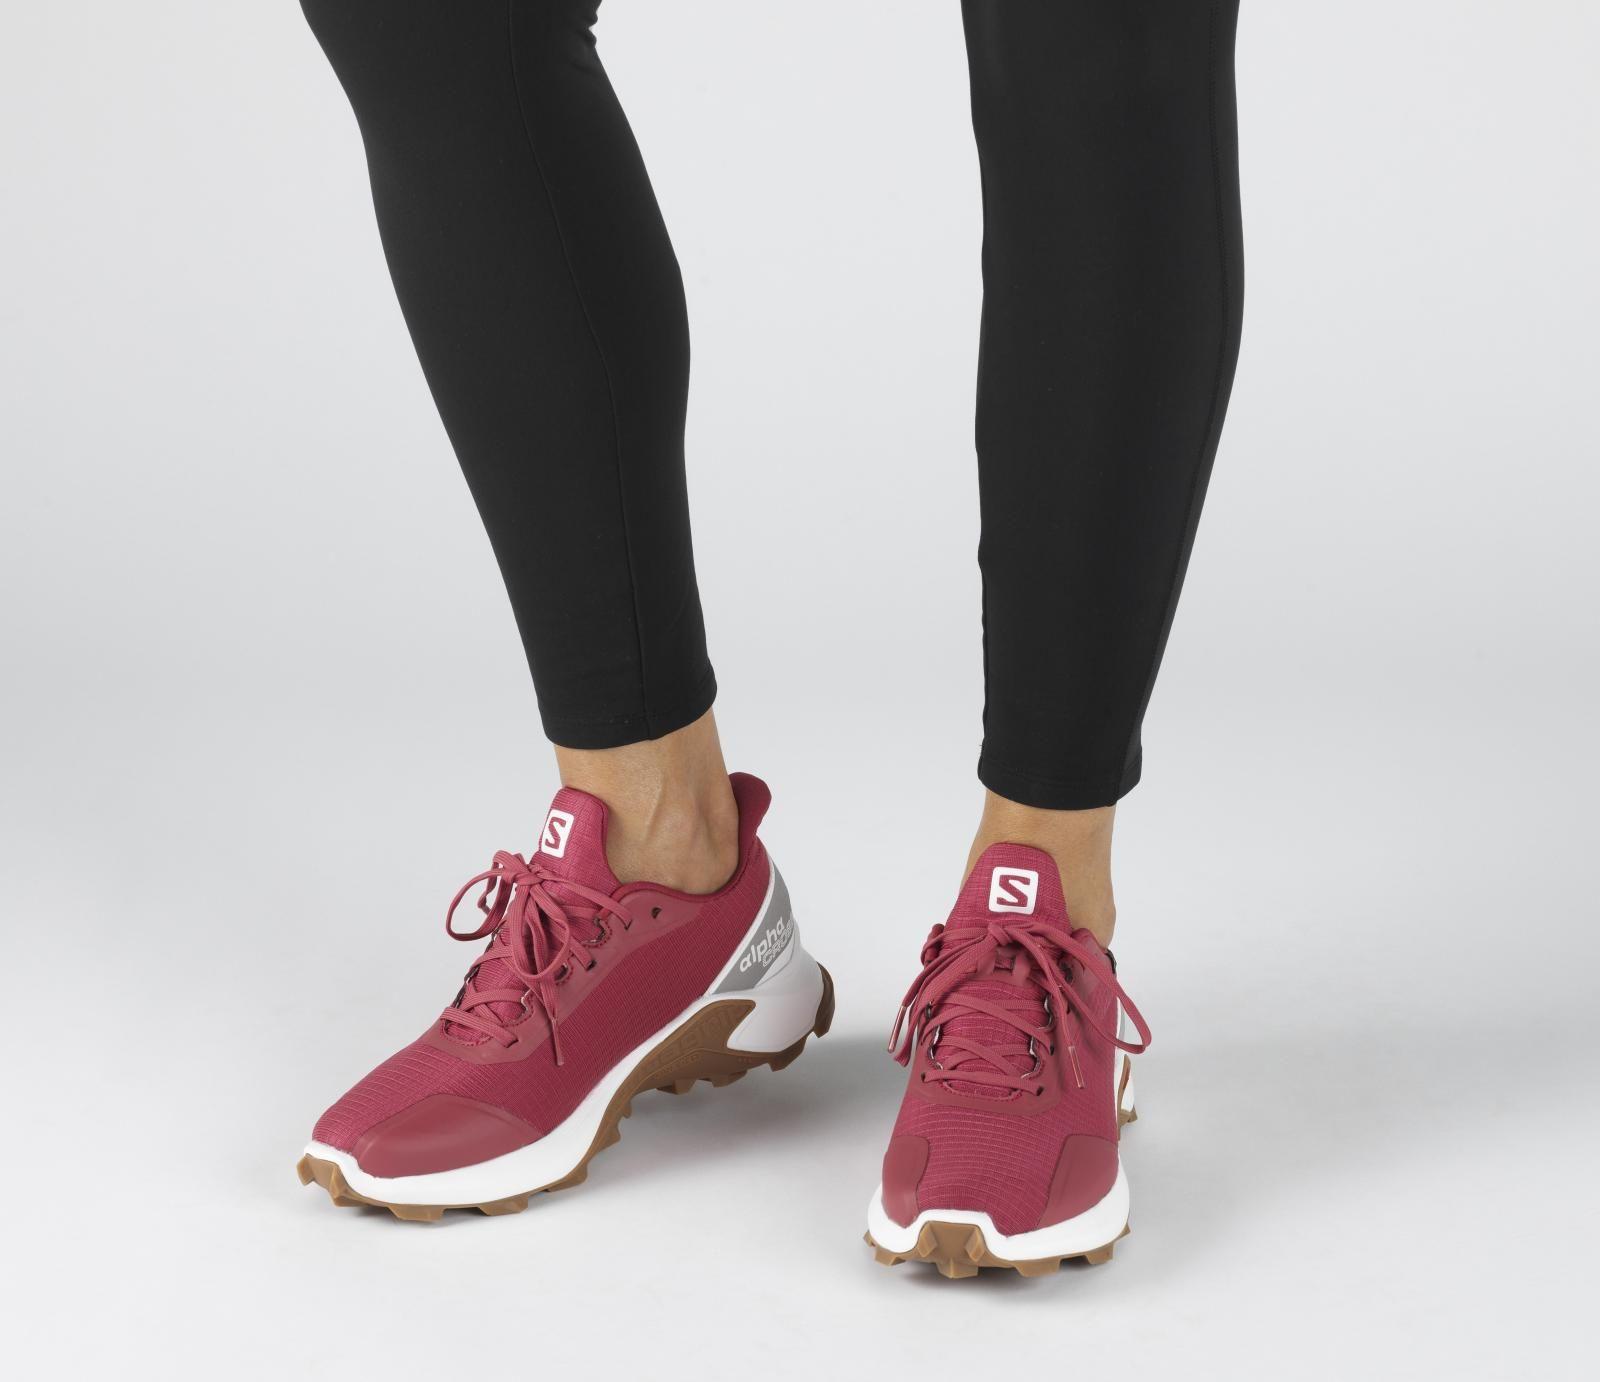 Salomon Alphacross GTX W trail running shoes red   Trail running shoes,  Salomon shoes, Running shoes